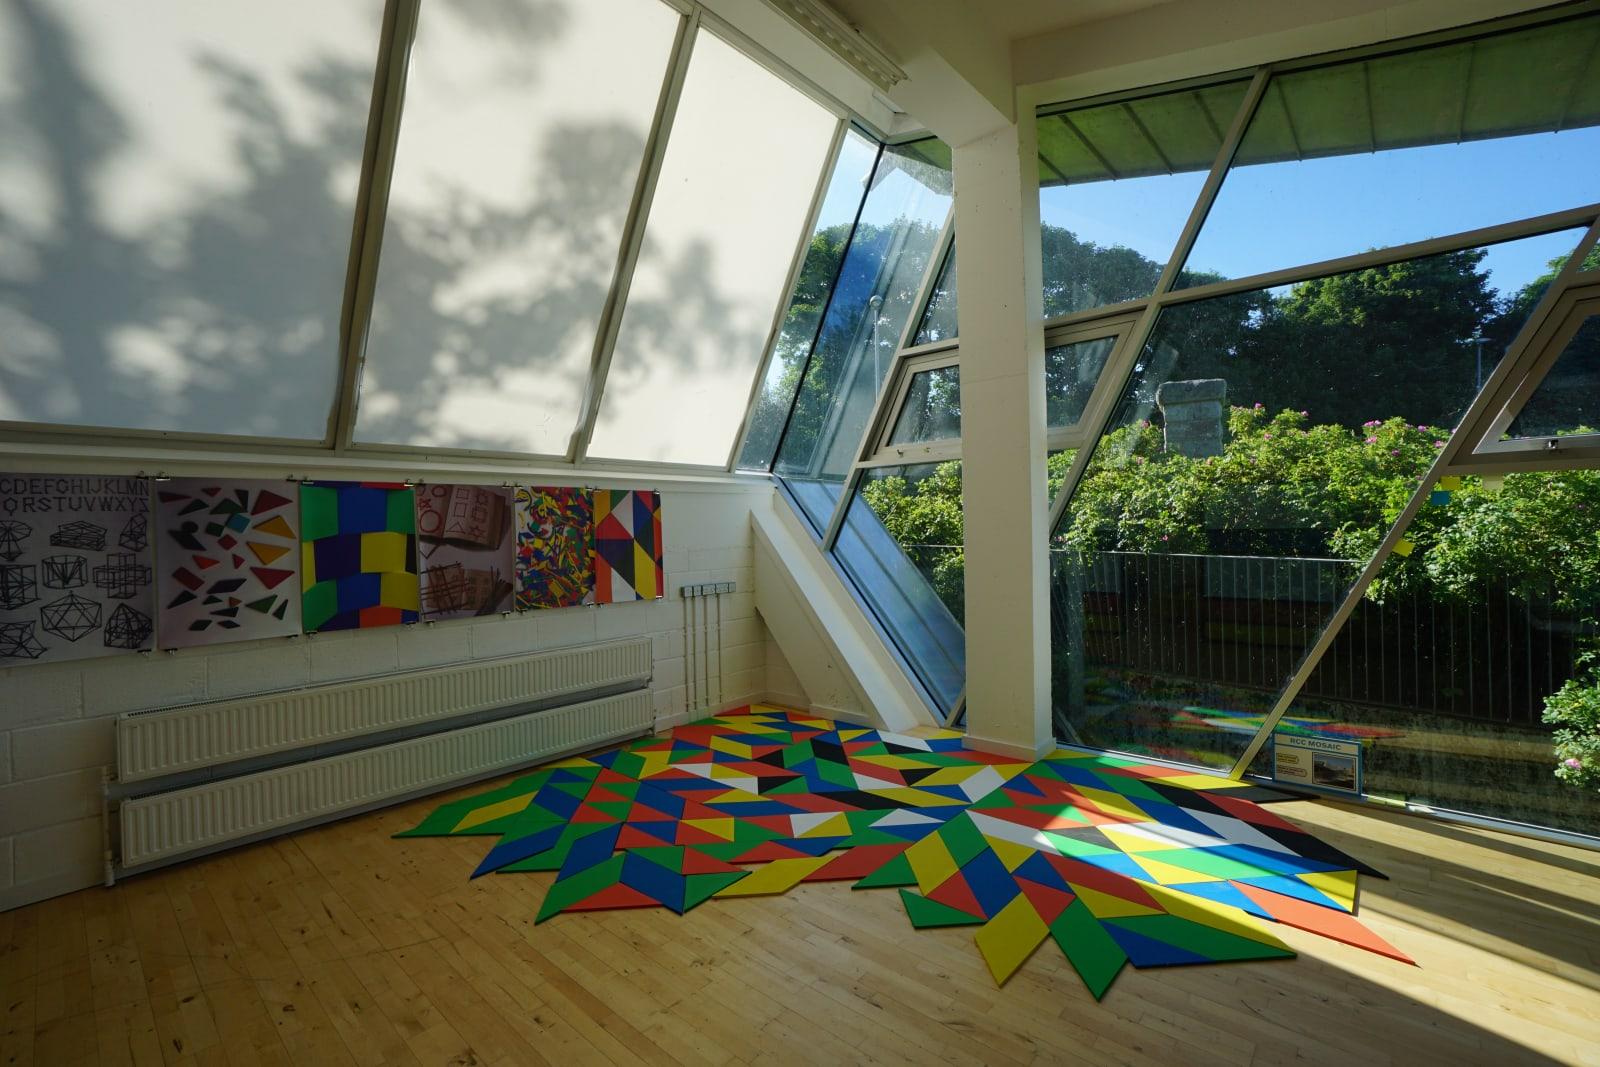 Exploring Architecture, Regional Cultural Centre, Letterkenny, Ireland, 2017